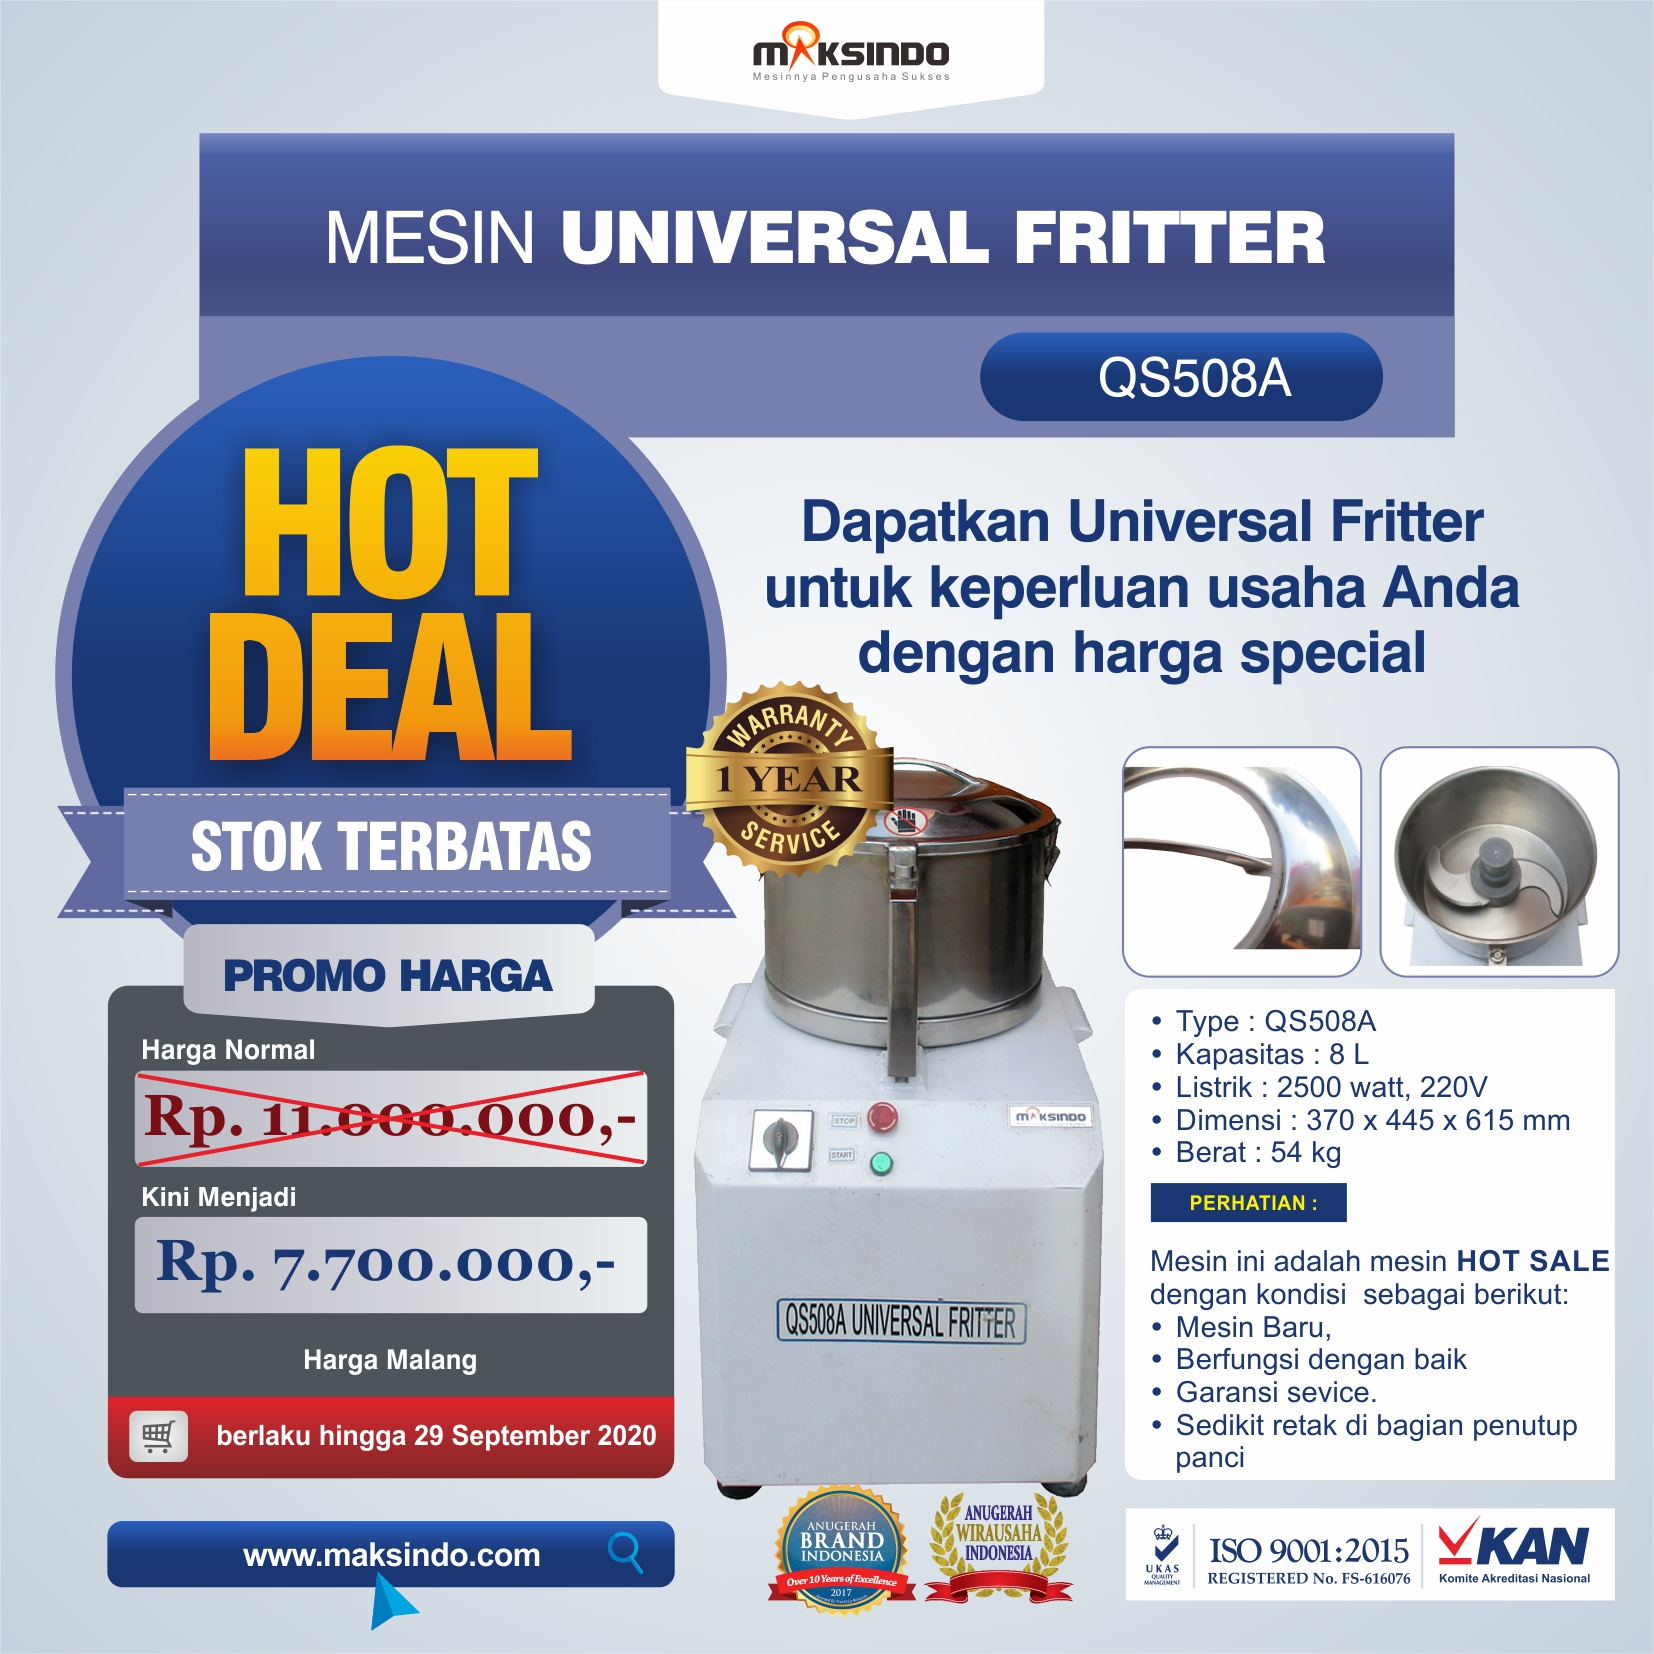 Jual Mesin Universal Fritter QS508A di Malang